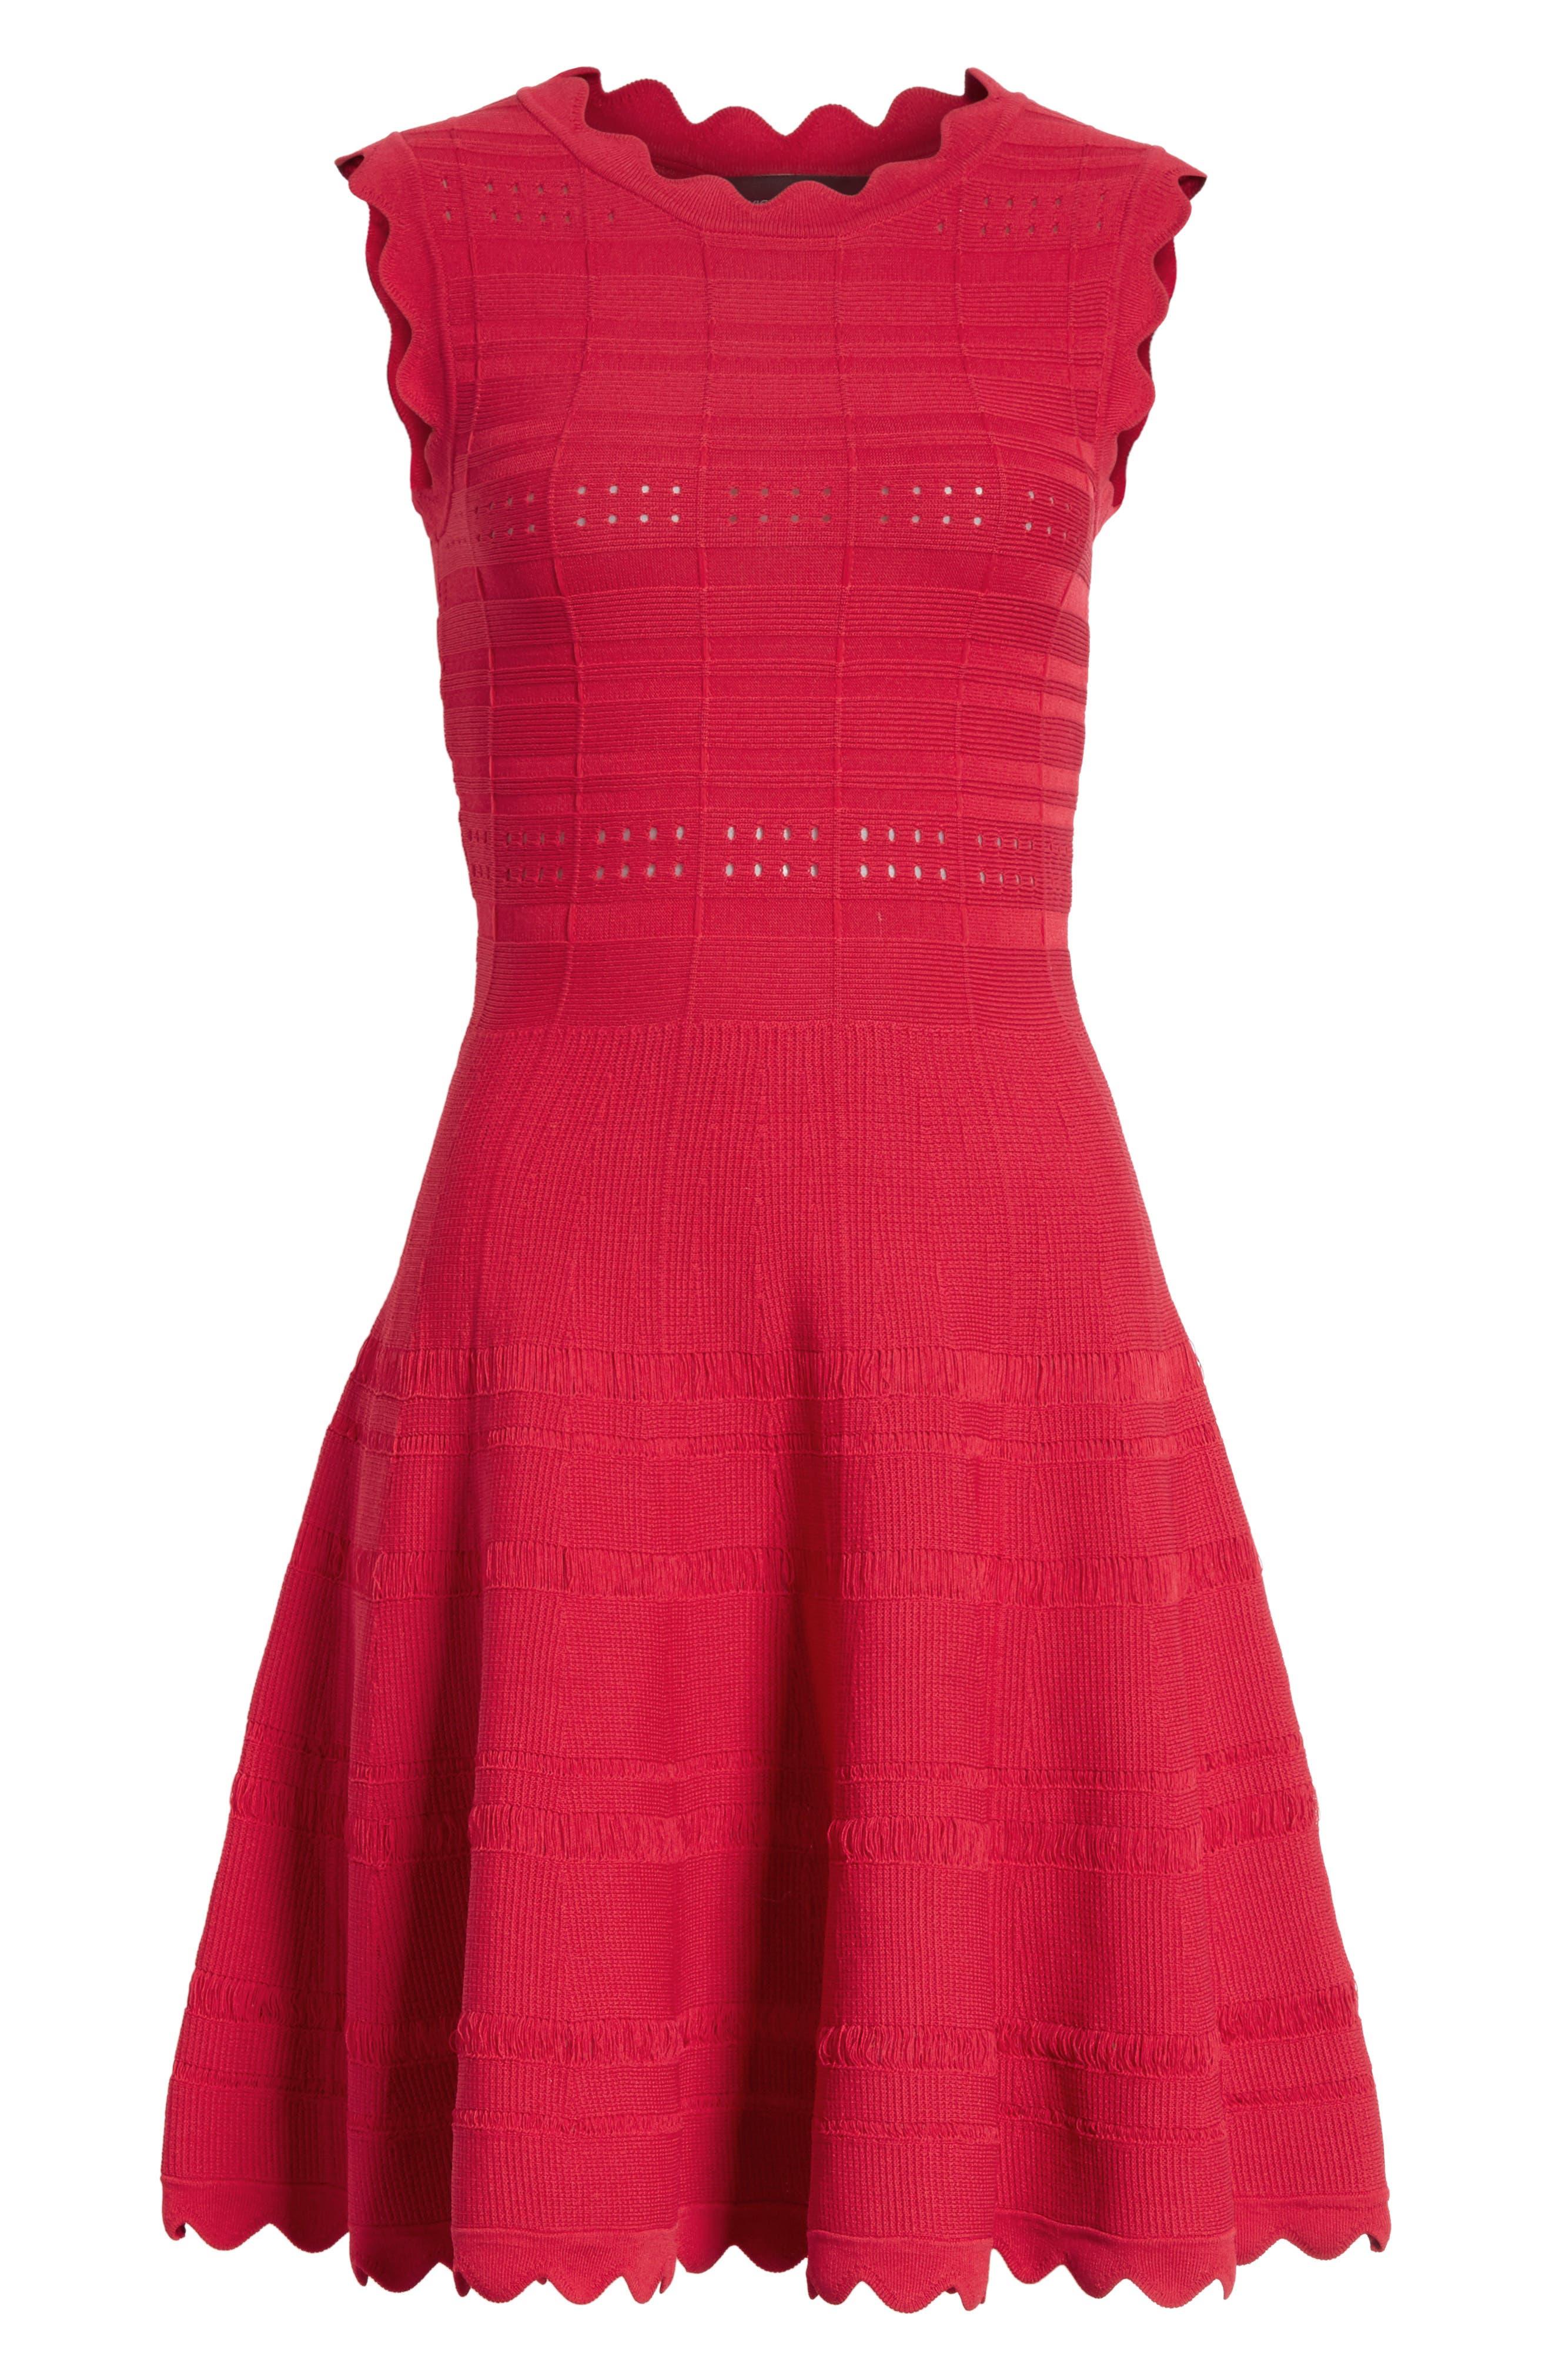 Scallop Trim Knit Dress,                             Alternate thumbnail 7, color,                             620